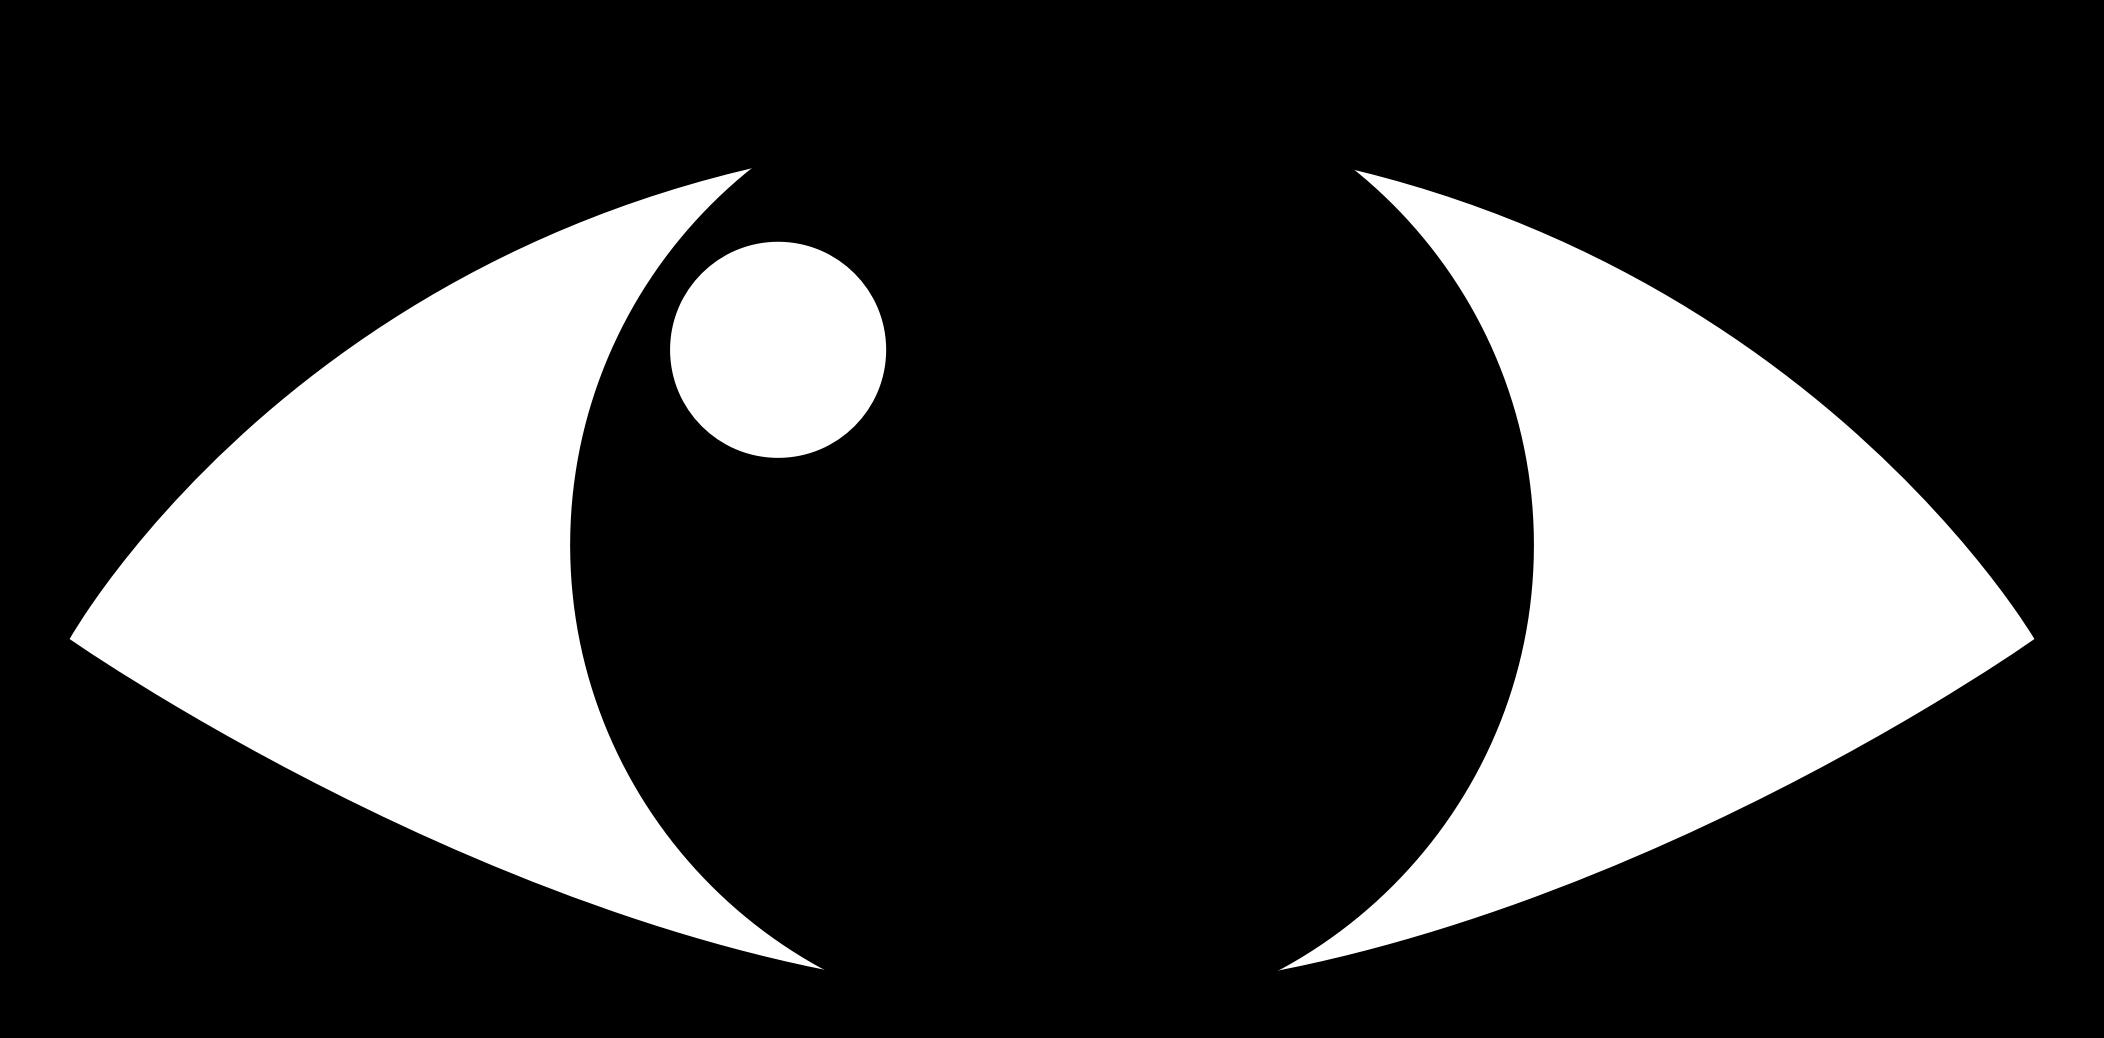 Clipart eye. Big image png